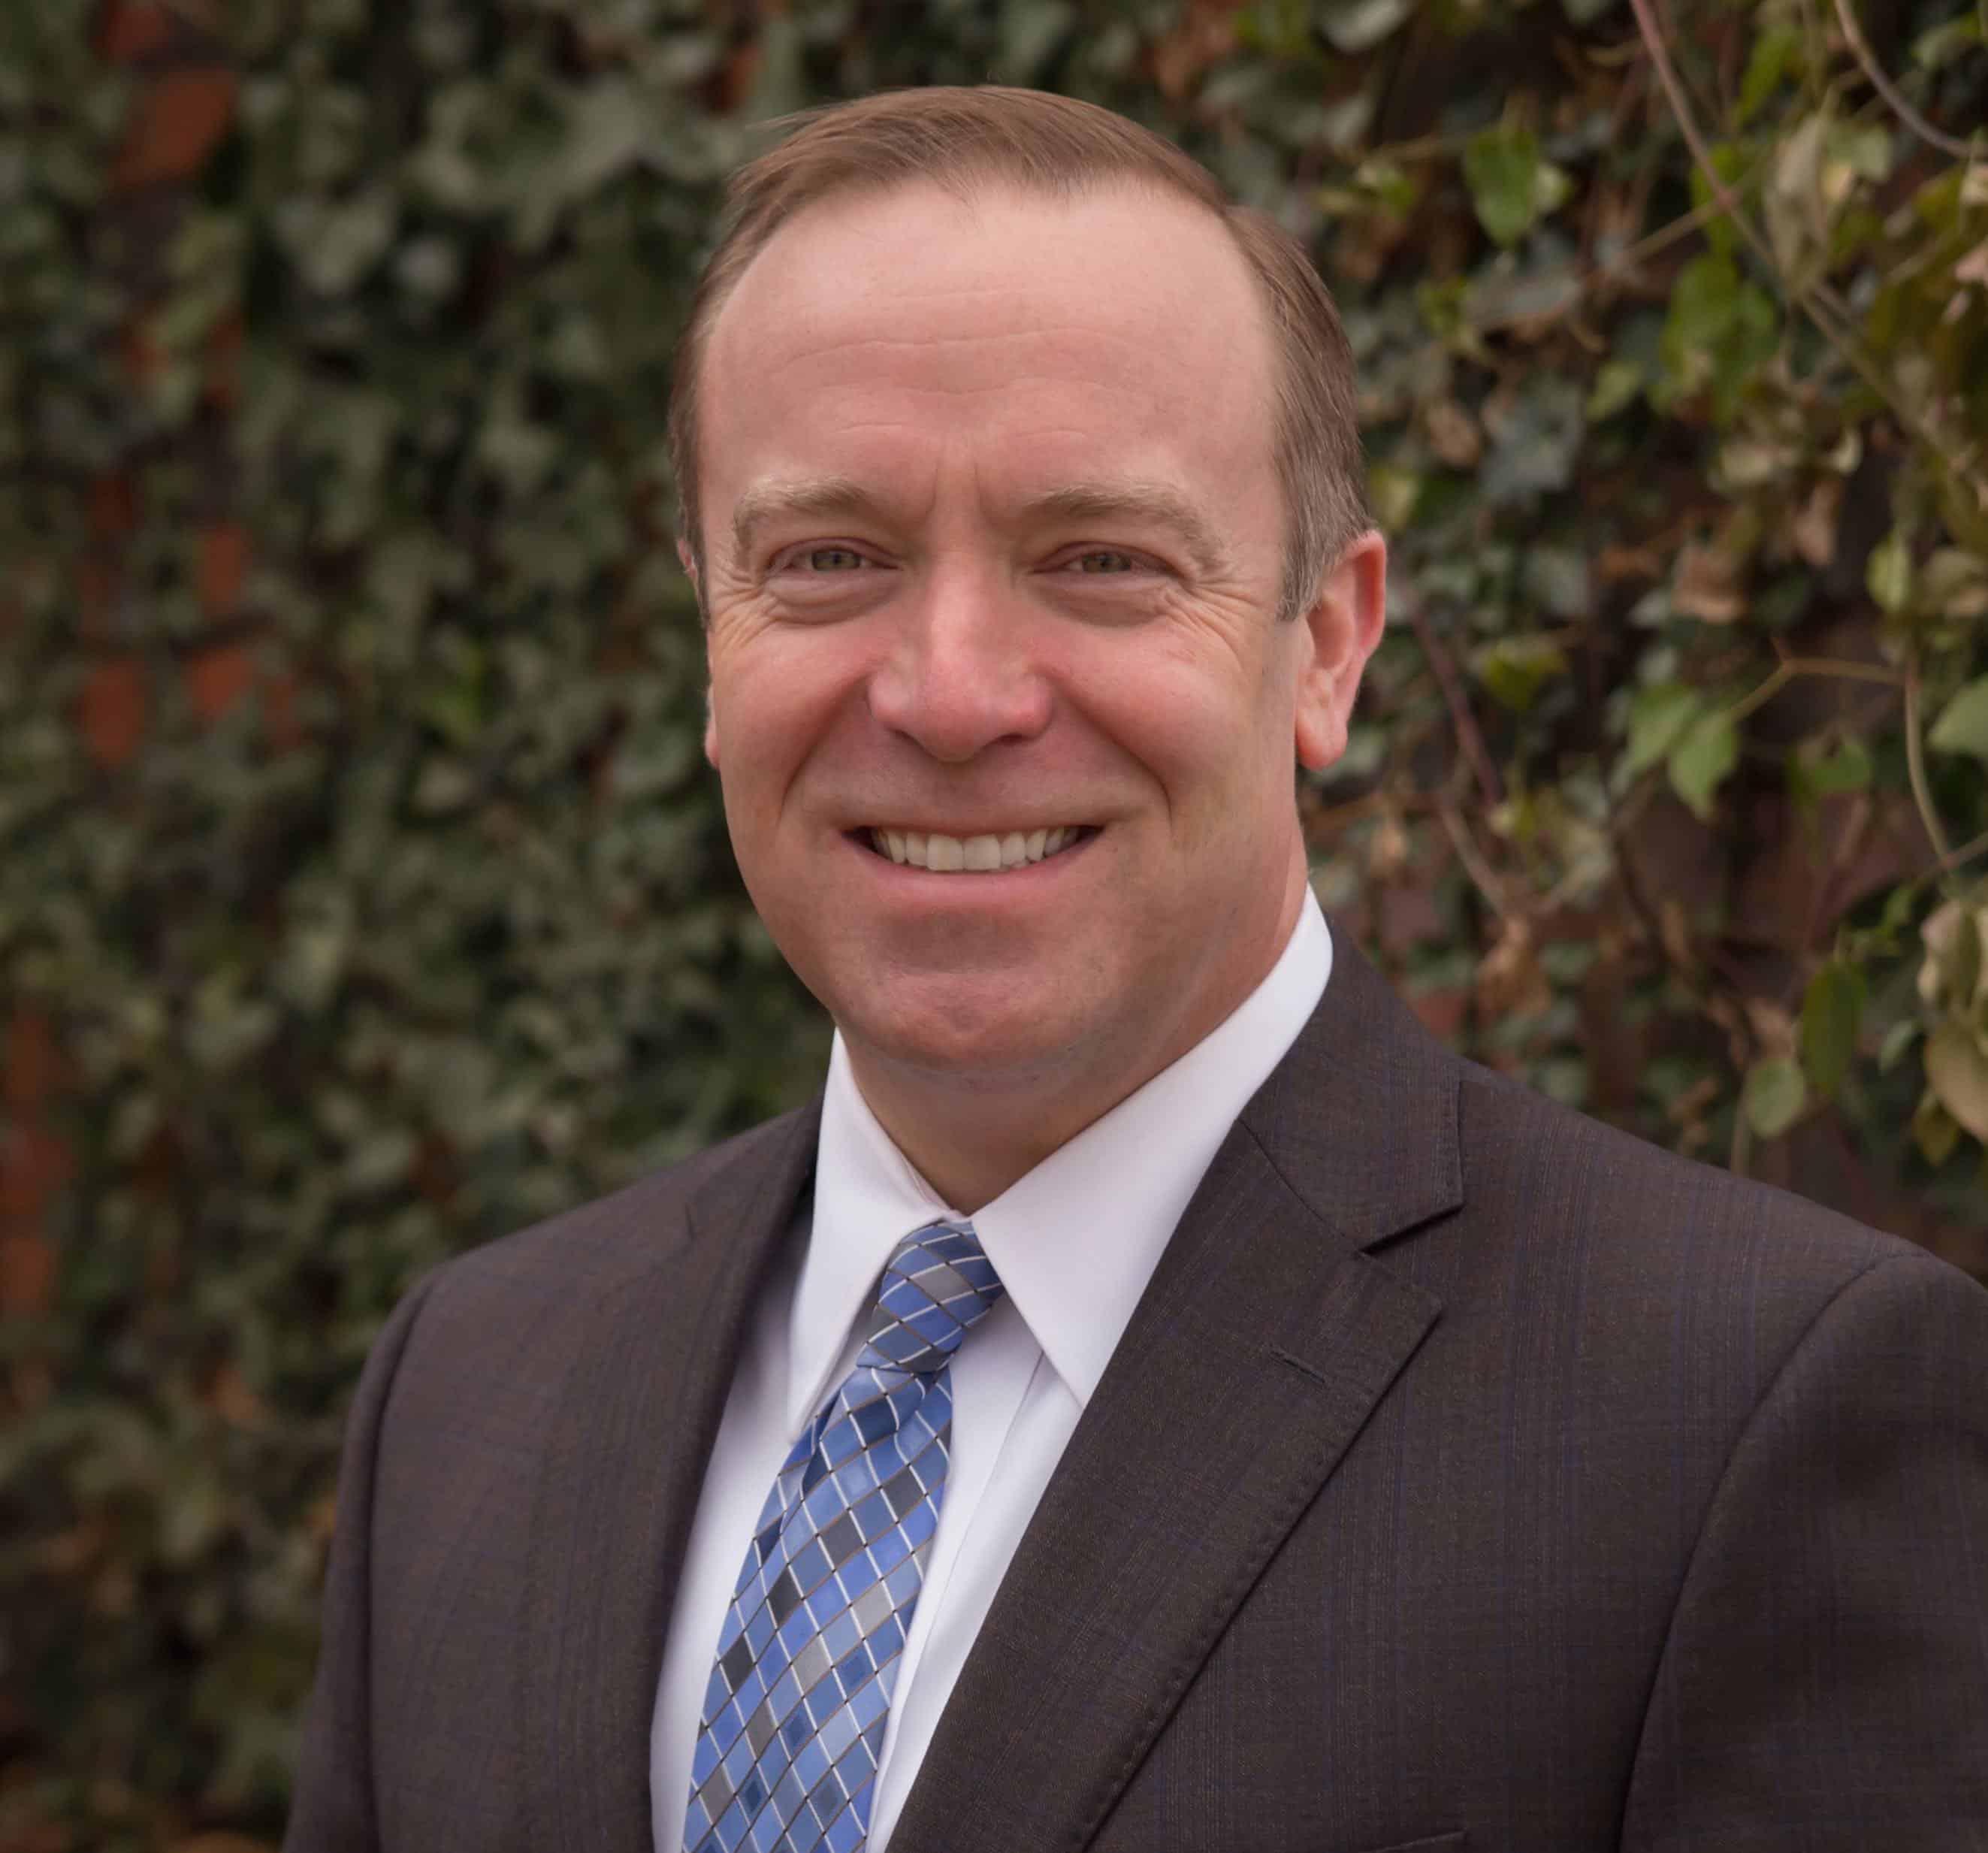 Tulsa personal injury laywer | John Truskett